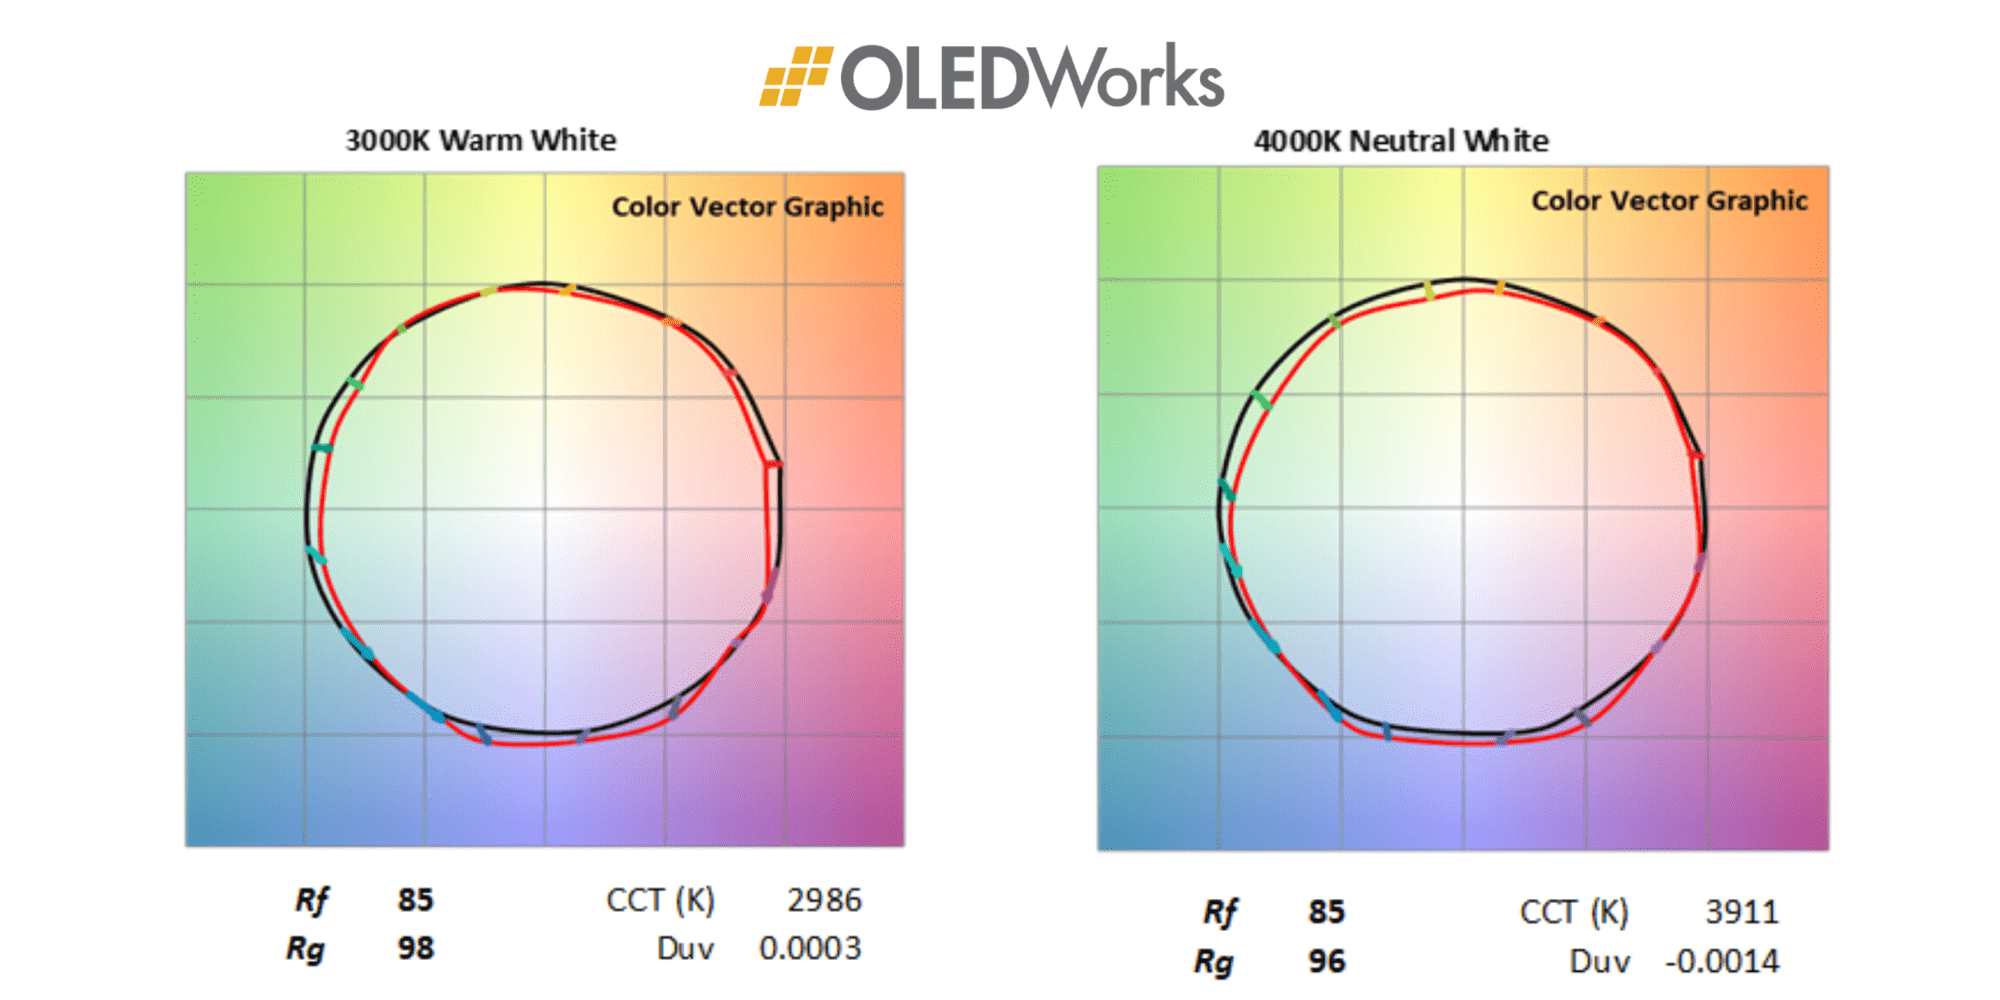 Brite 3 Color Vectors | OLEDWorks